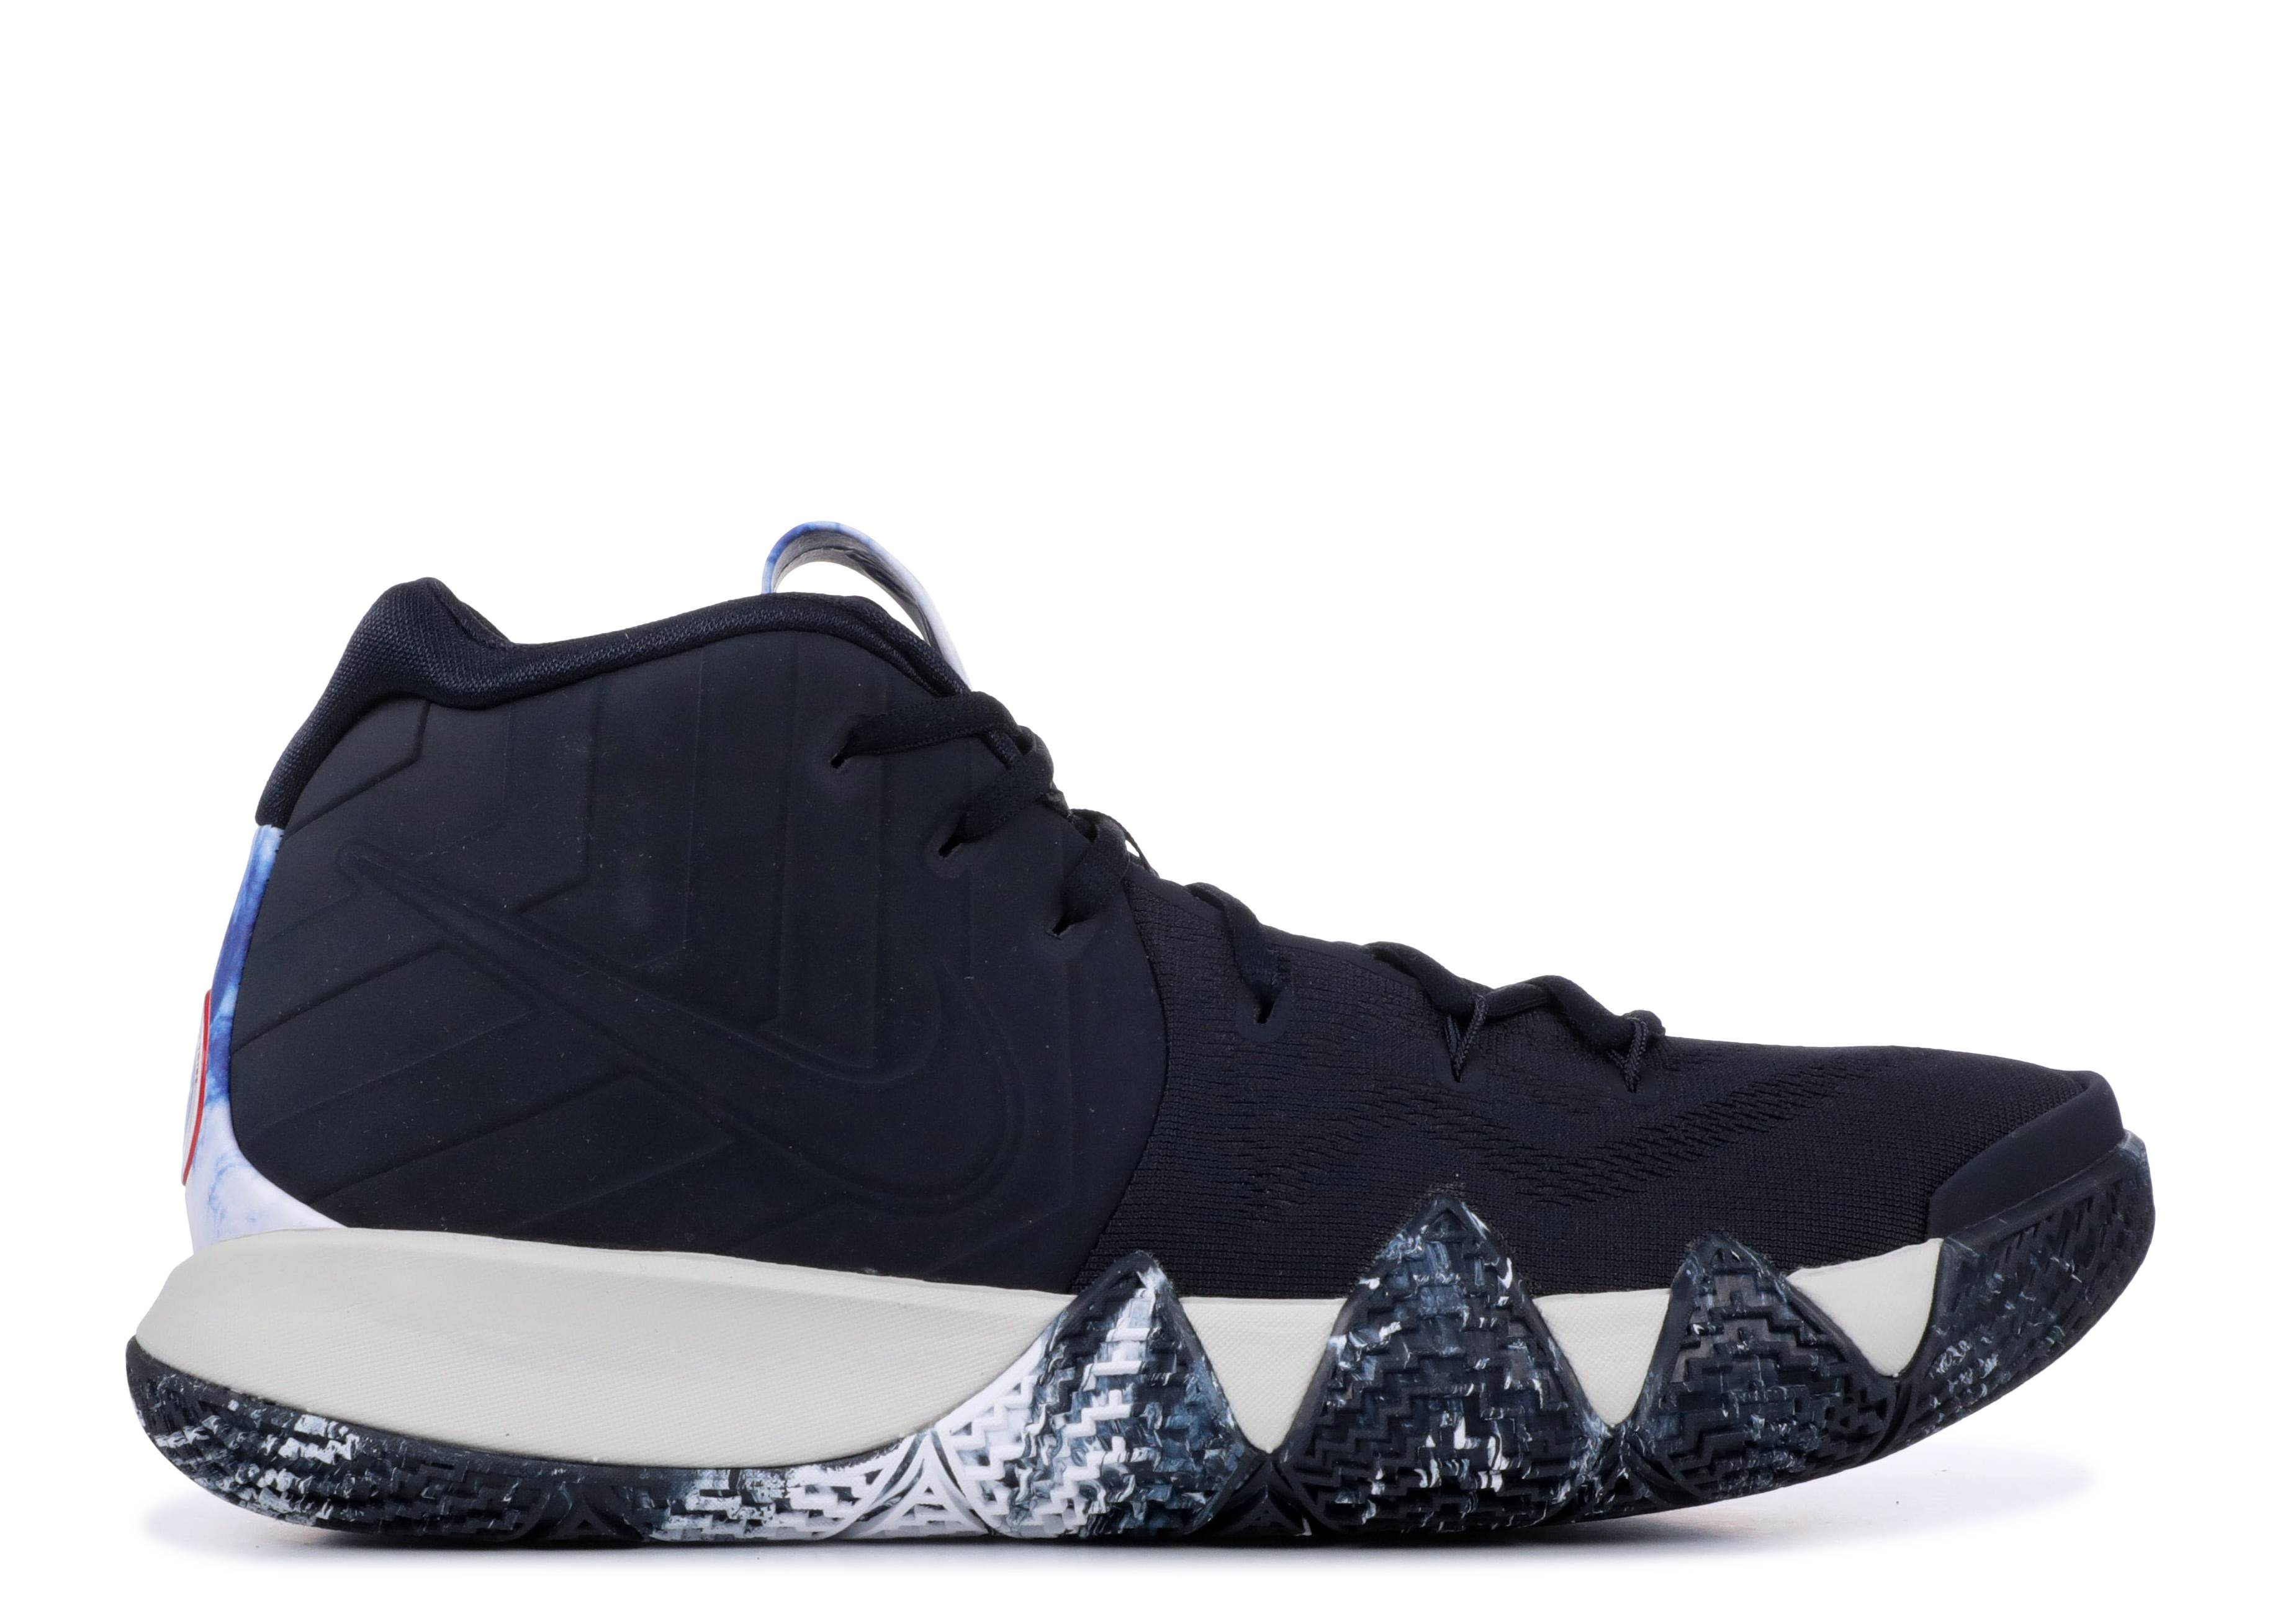 93d4b7da0db Kyrie Irving - Nike Basketball - Nike